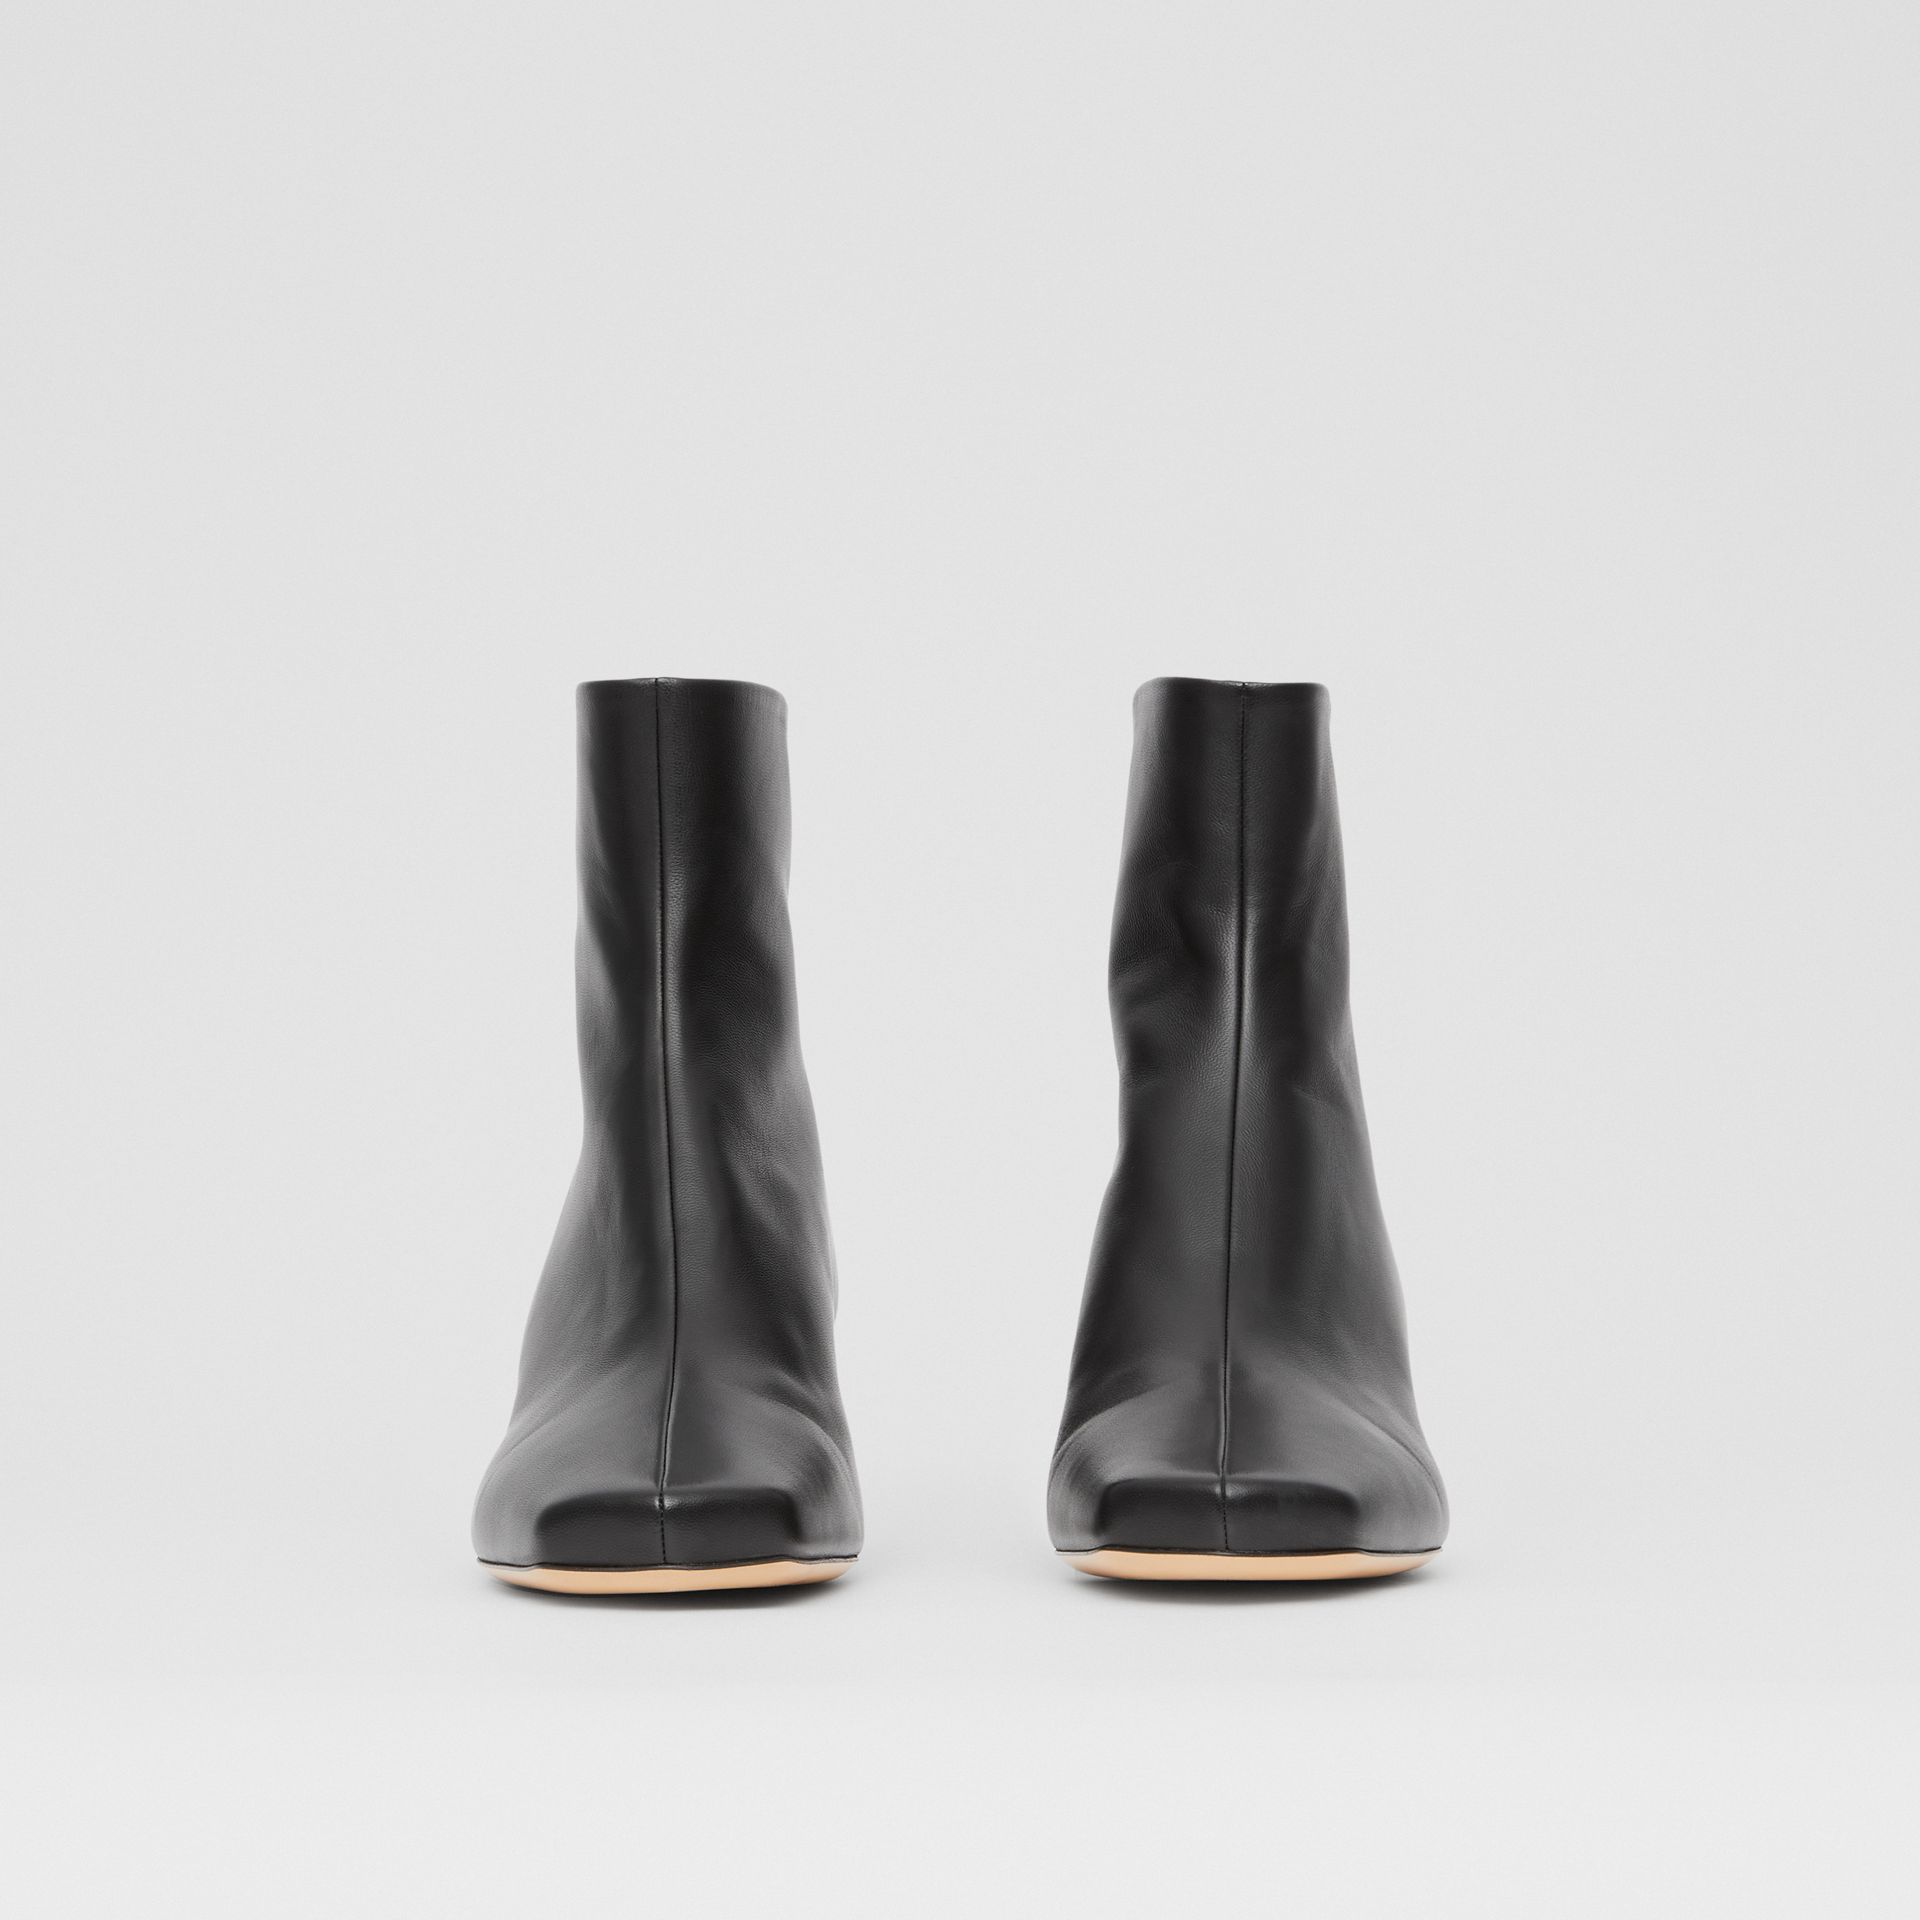 Lambskin Sculptural Kitten-heel Ankle Boots in Black - Women | Burberry - gallery image 3